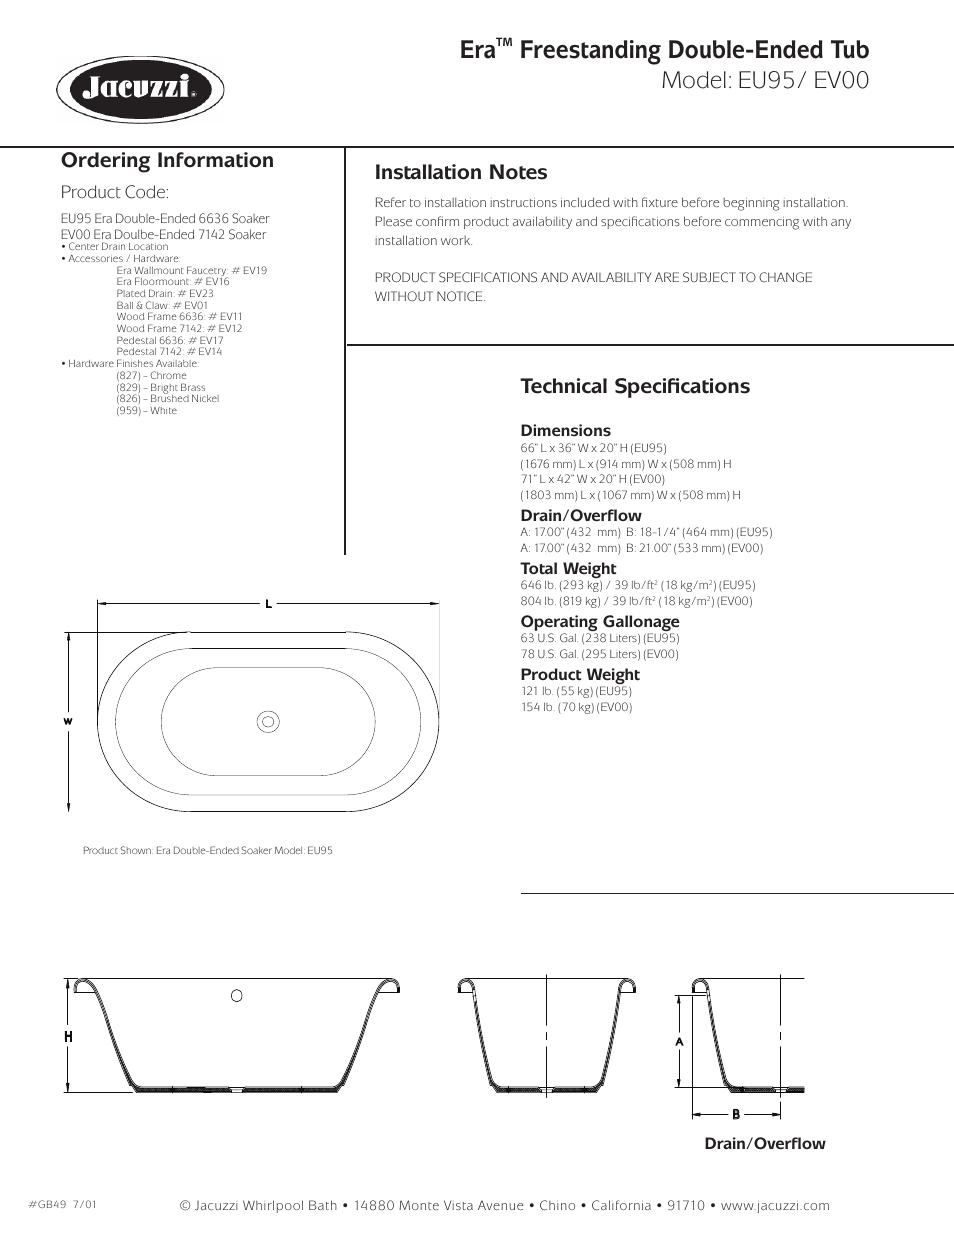 Freestanding double-ended tub, Model: eu95/ ev00, Ordering ...